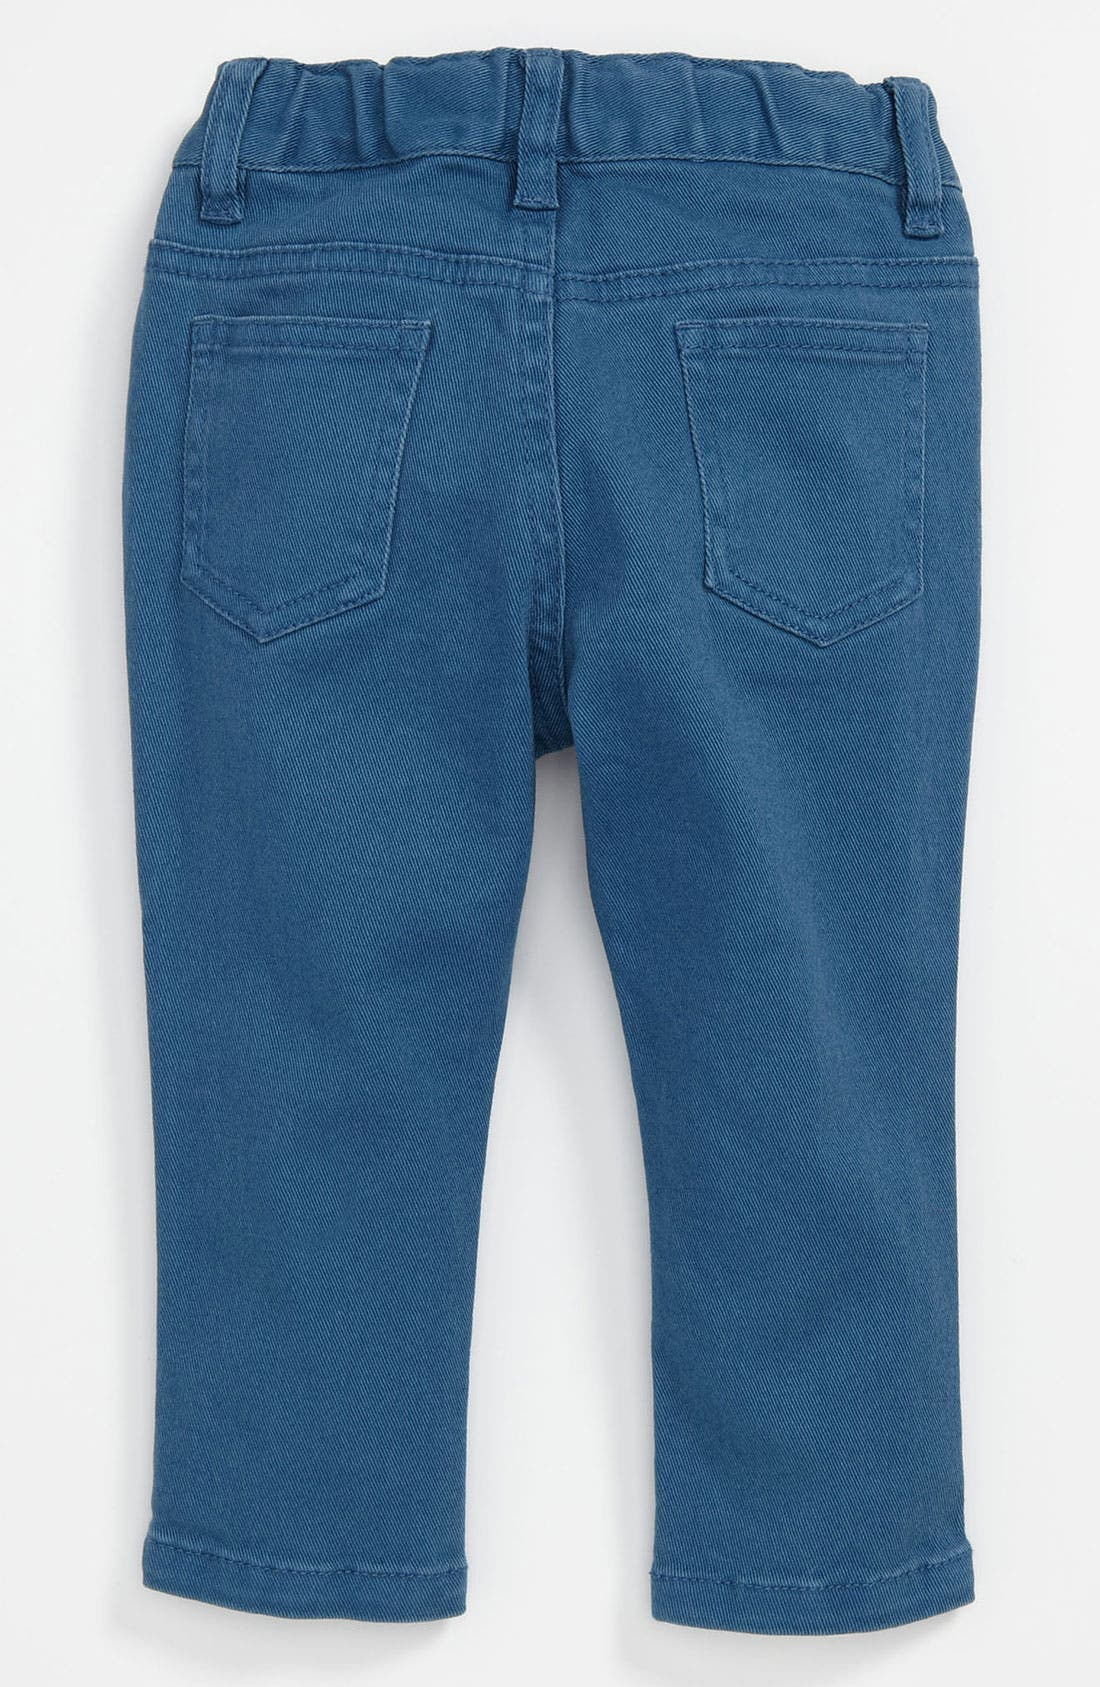 Main Image - Pumpkin Patch 'Slim Fit' Color Jeans (Toddler)